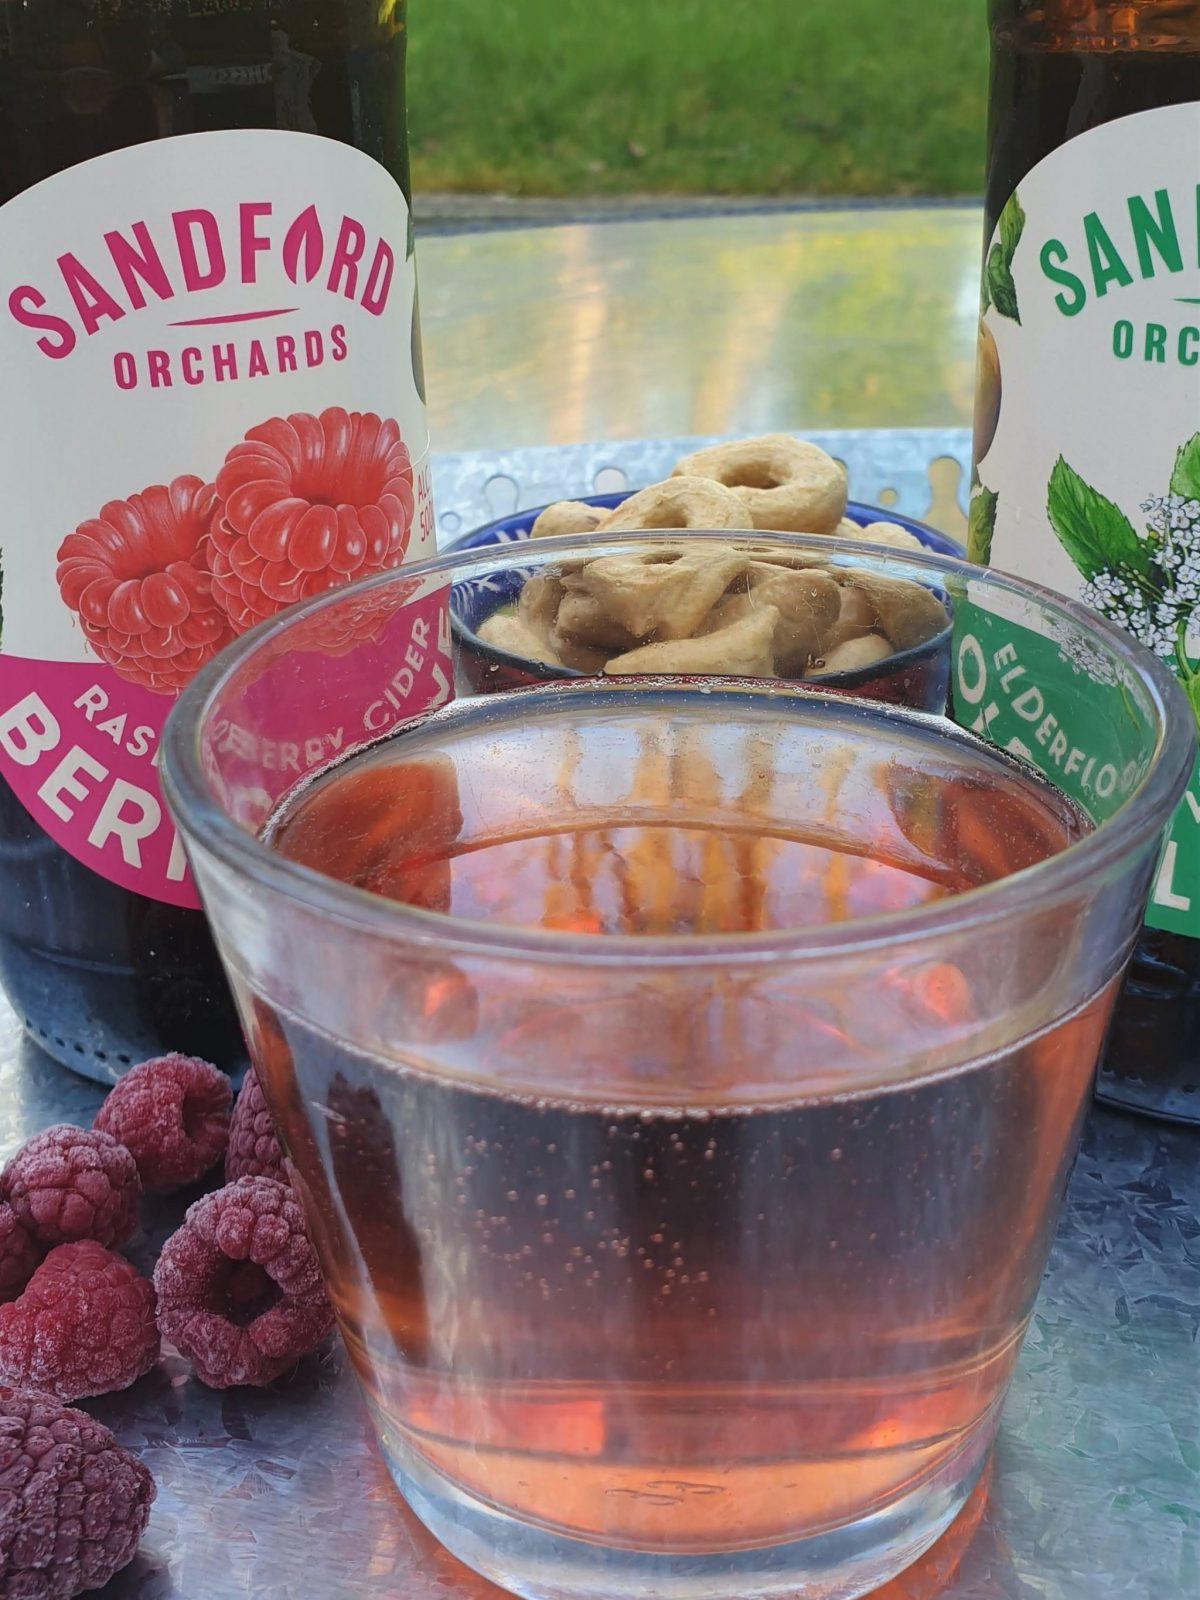 Sandford orchard raspberry cider